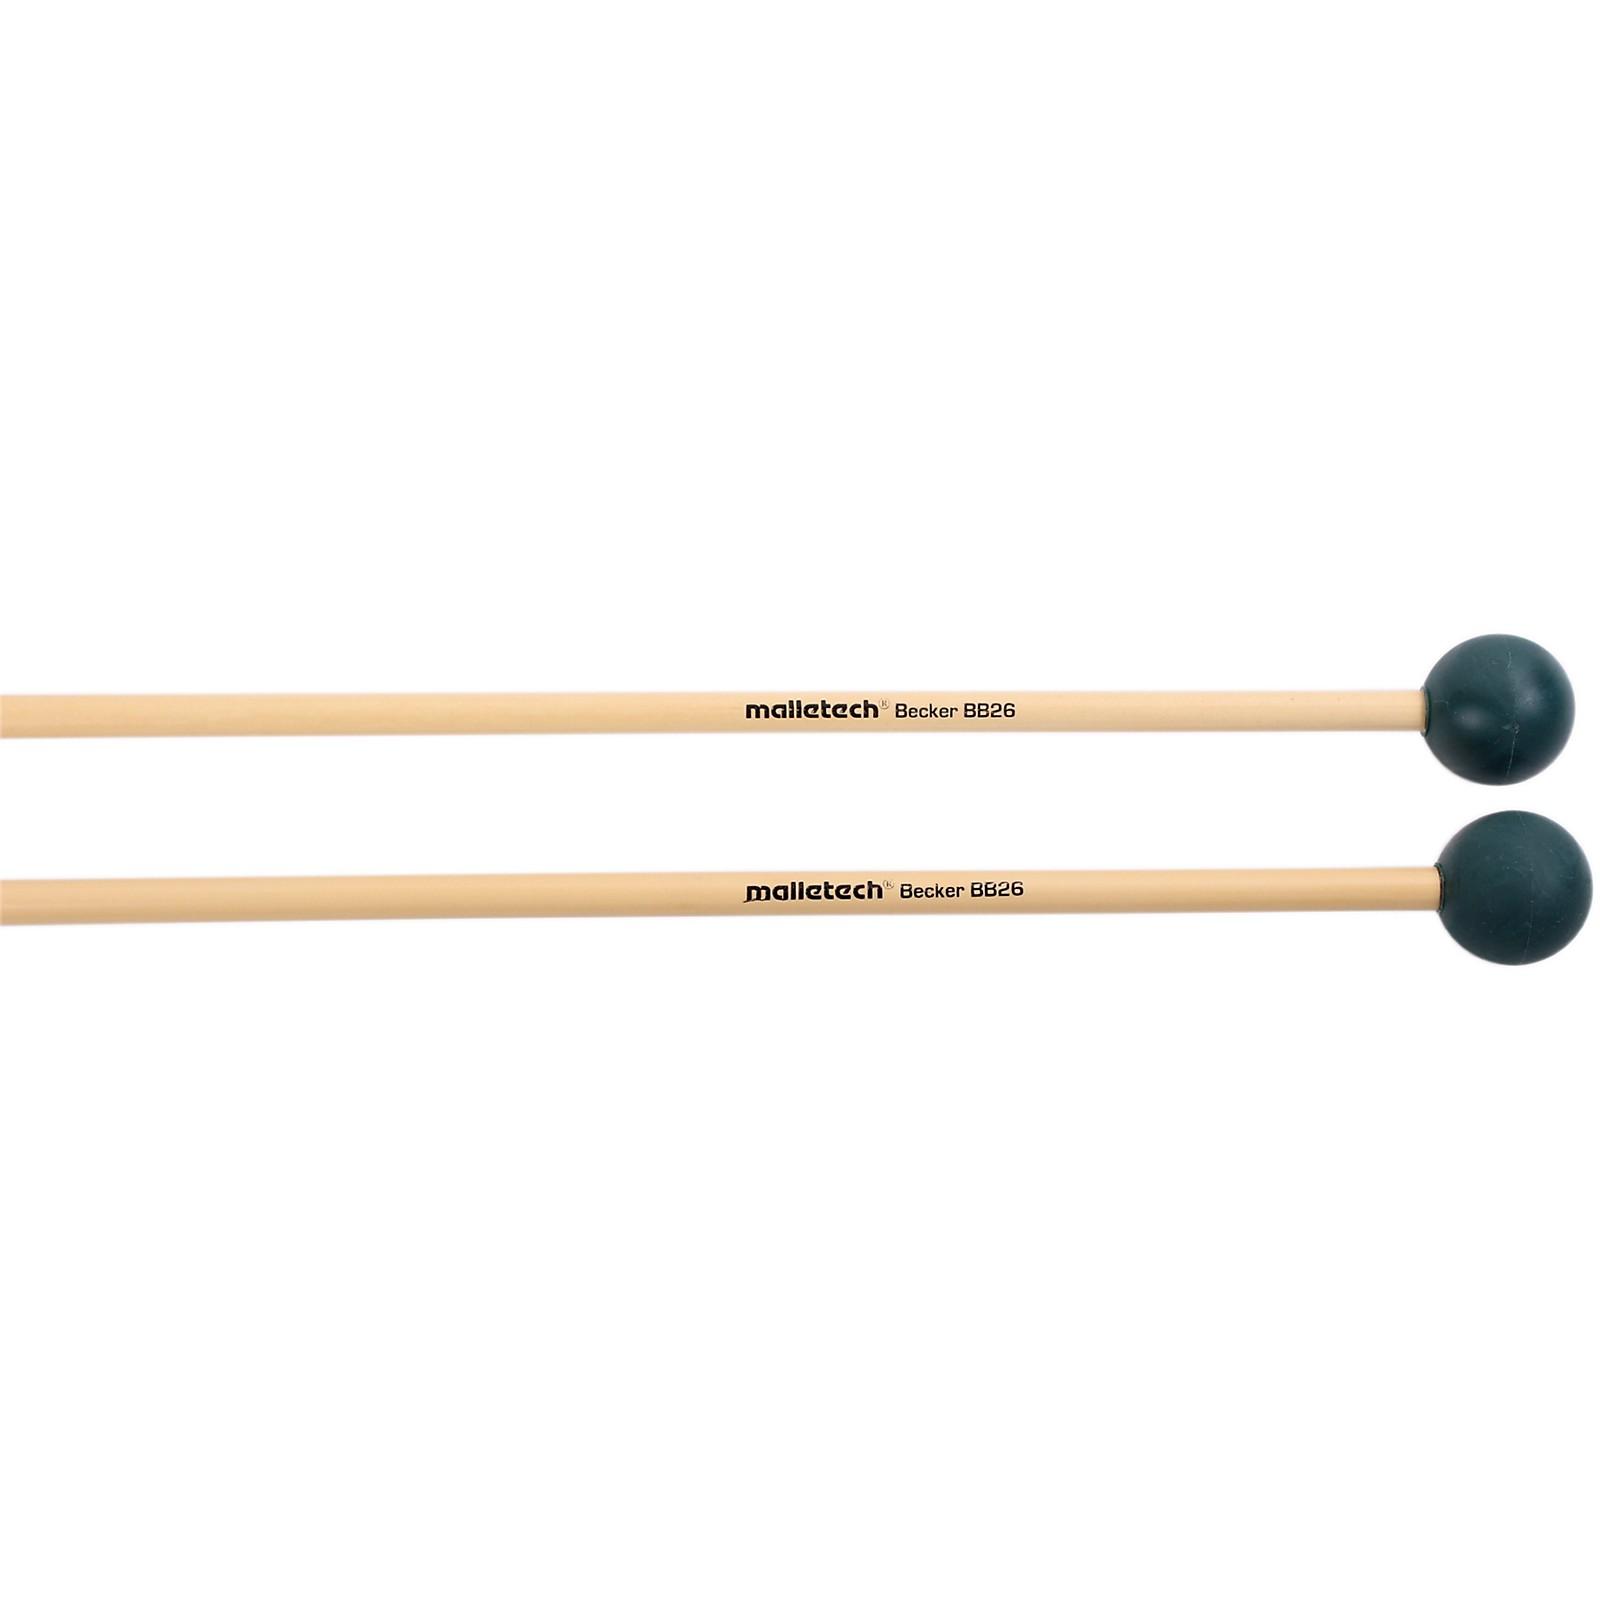 Malletech Bob Becker Xylophone Mallet - Medium Hard